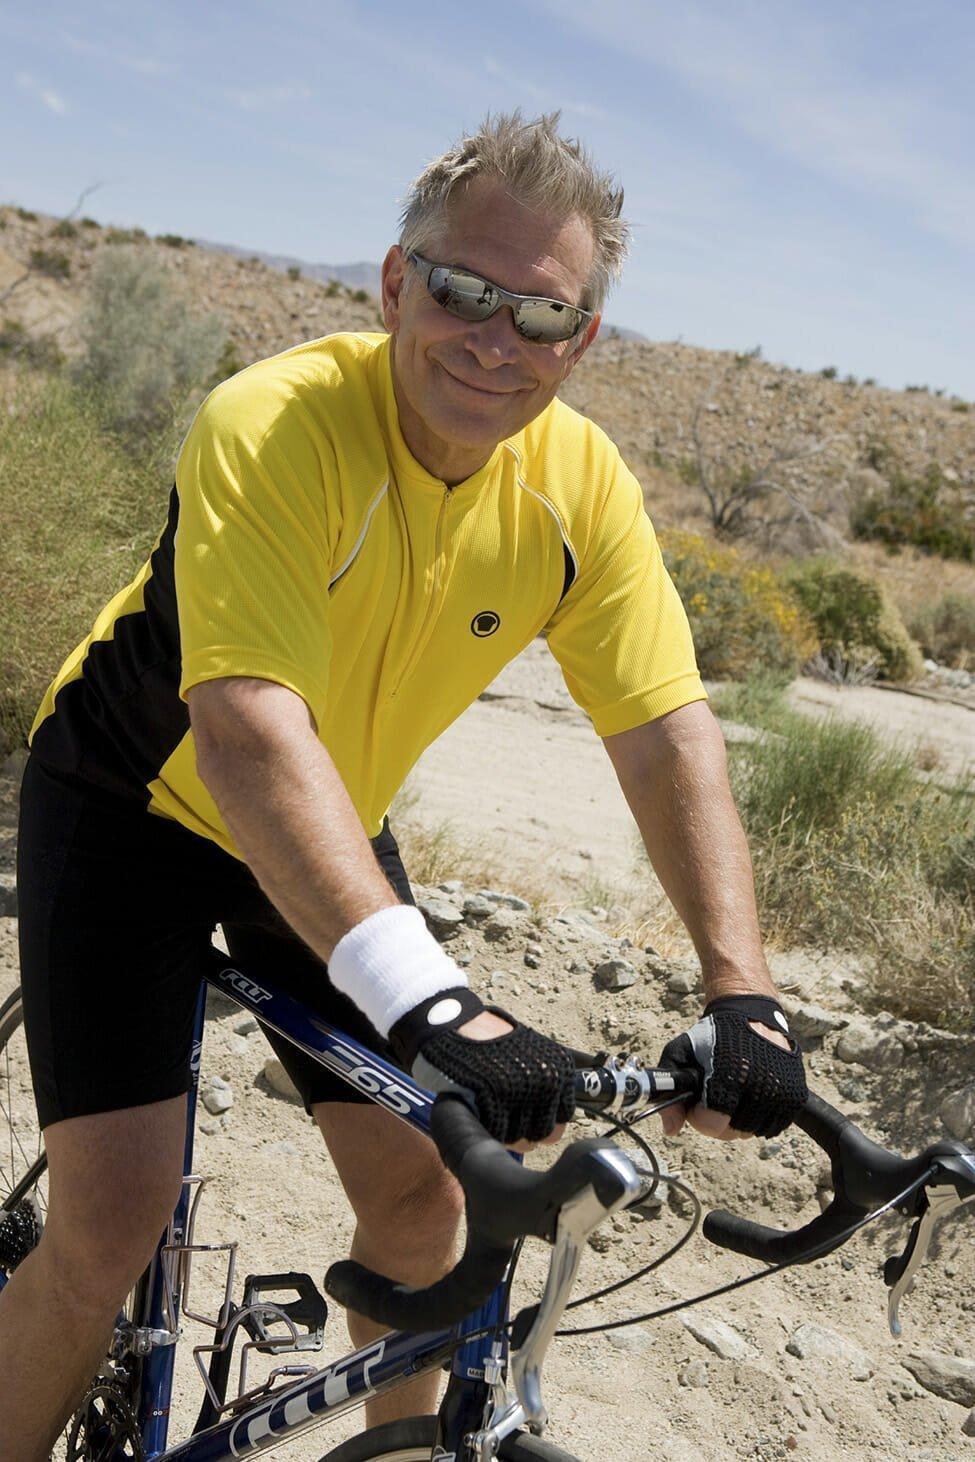 Senior man riding bike